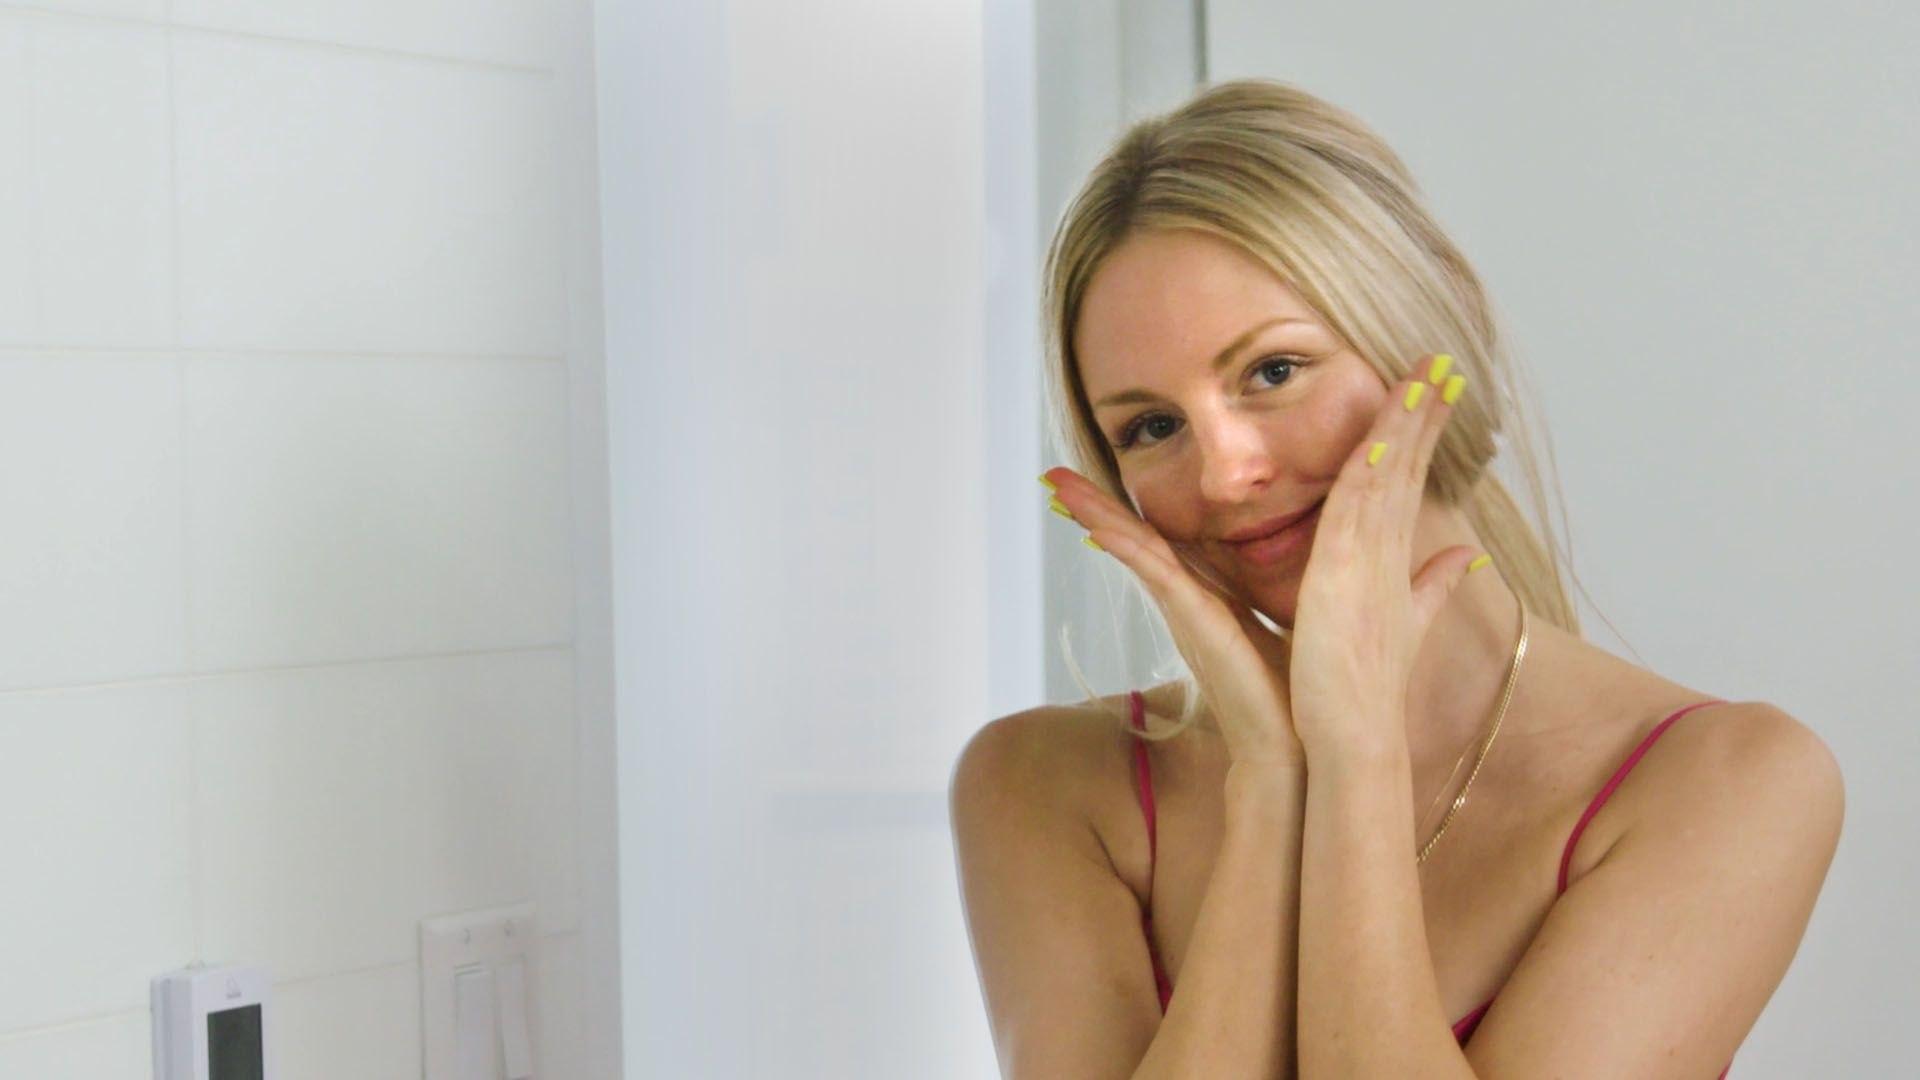 Watch Shae Marie's Nighttime Skincare Routine